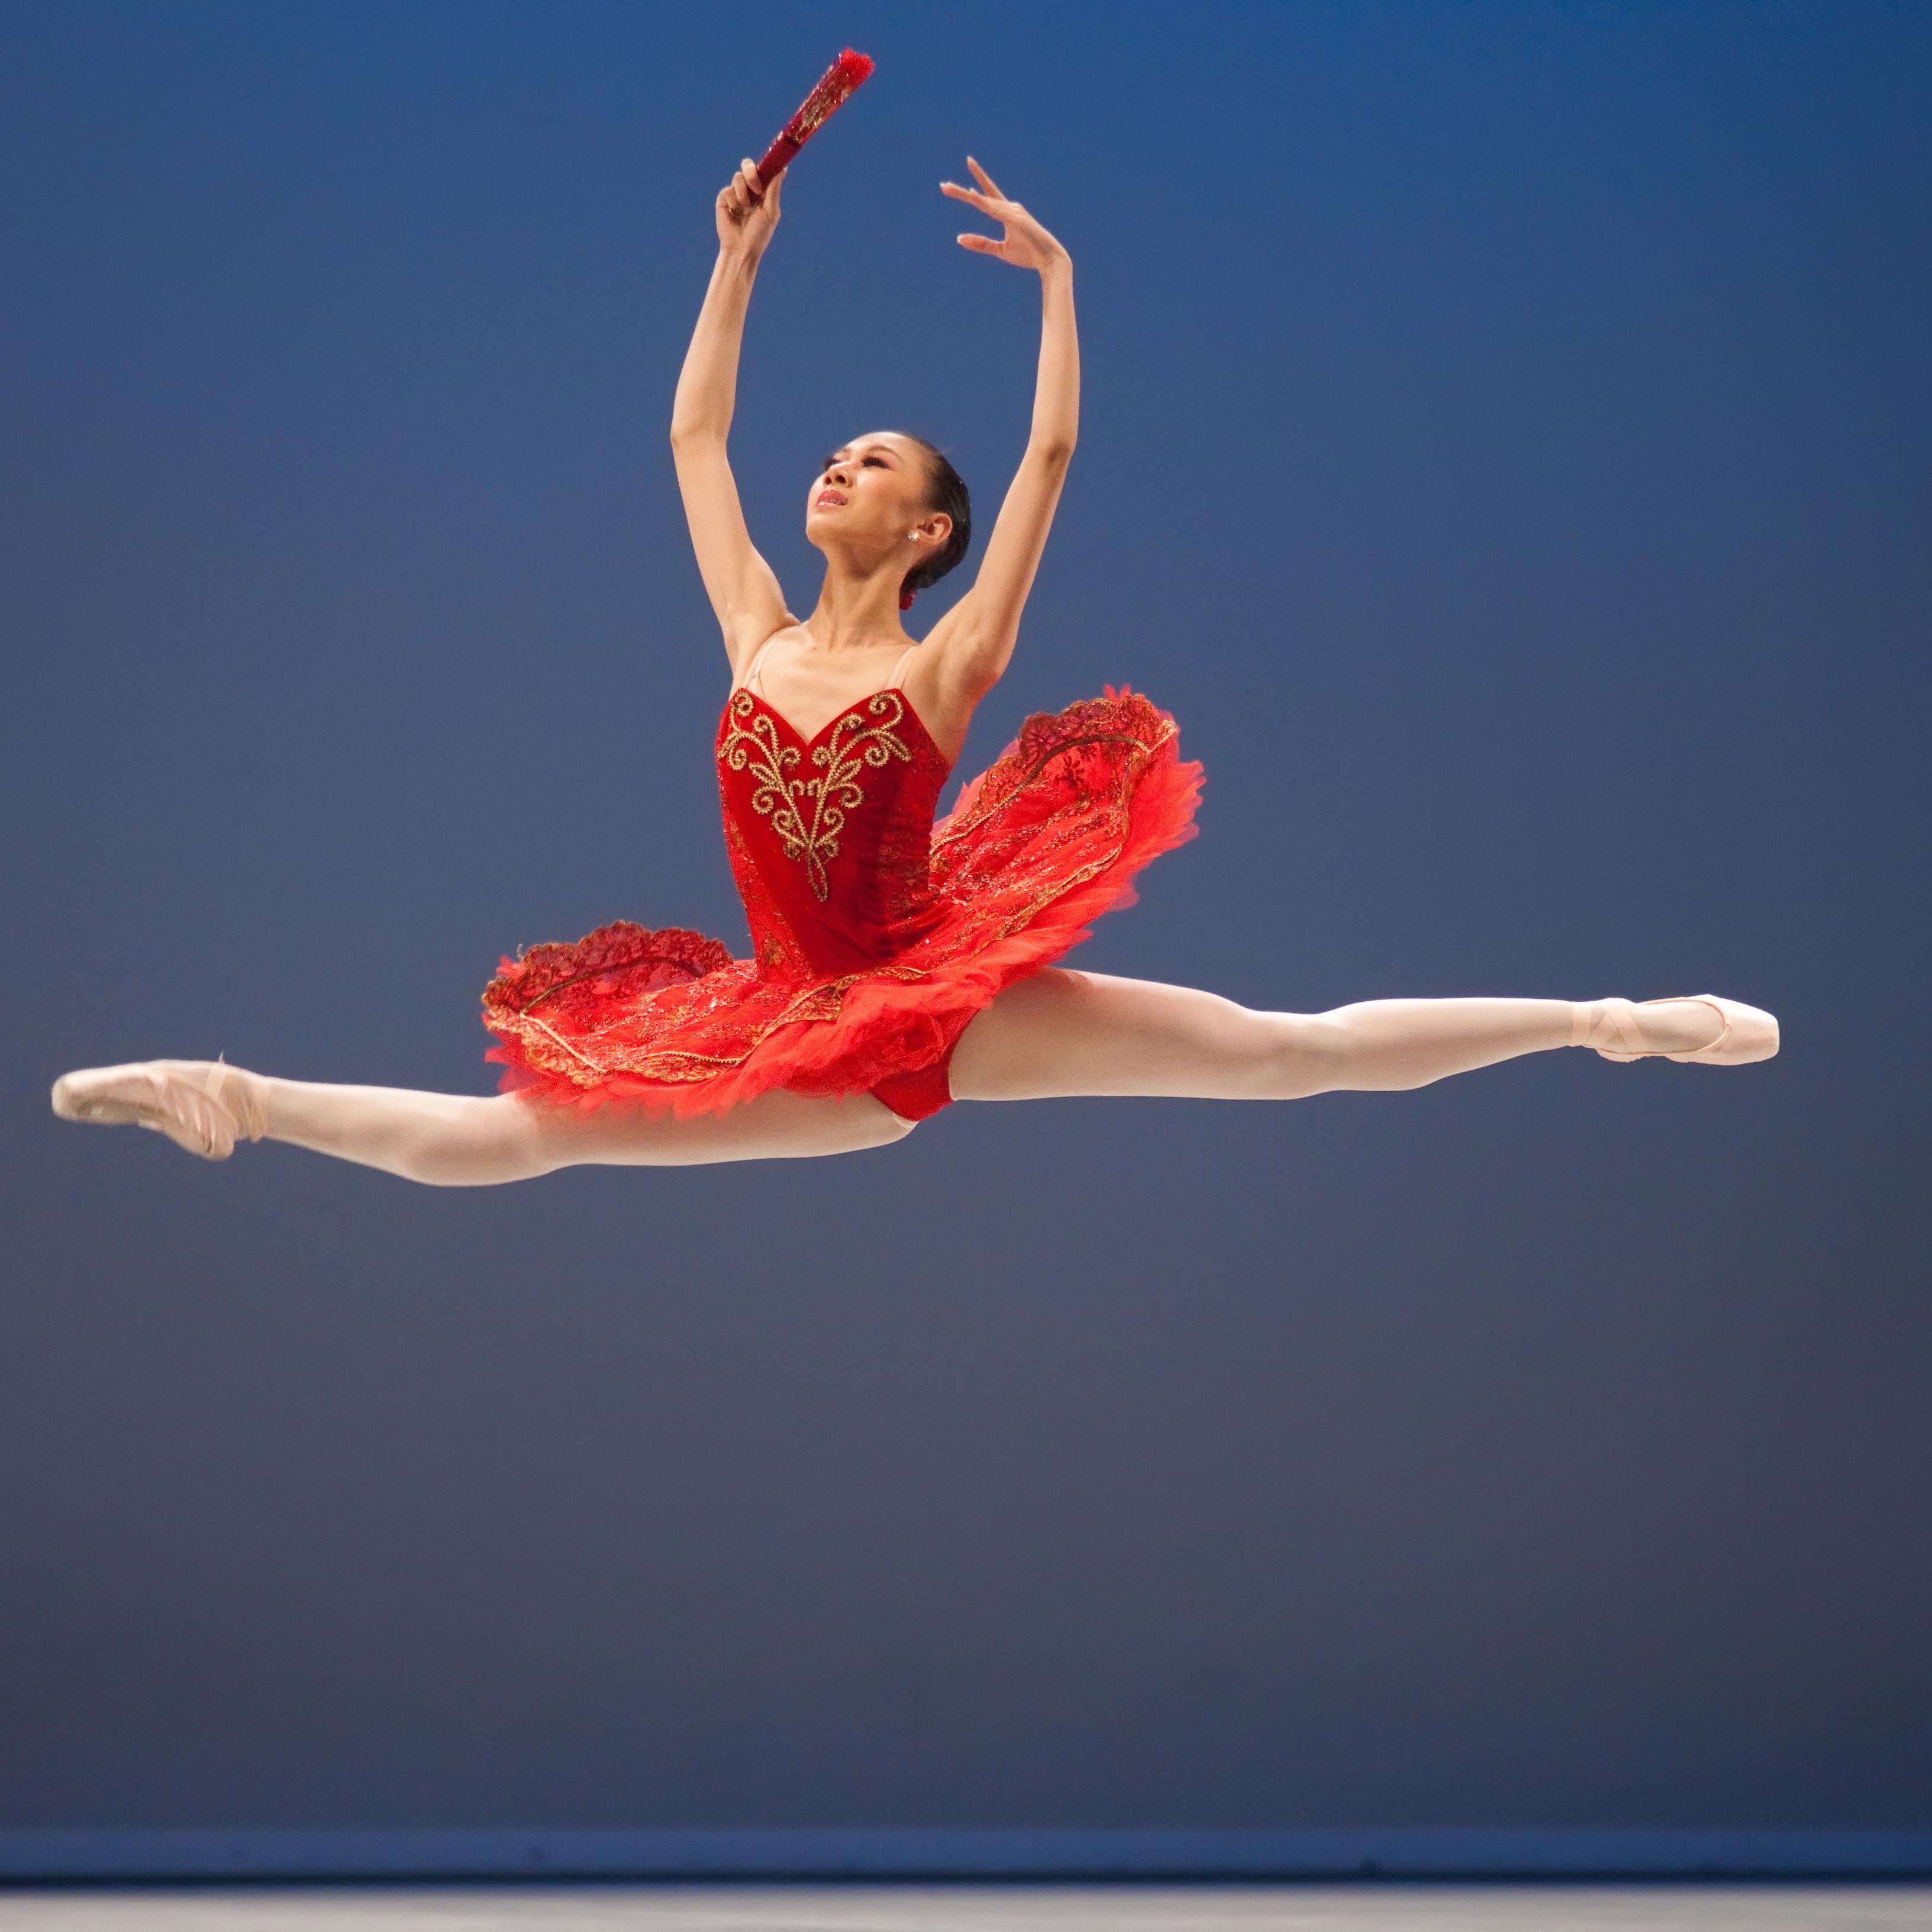 Ballon Ballet Wikipedia